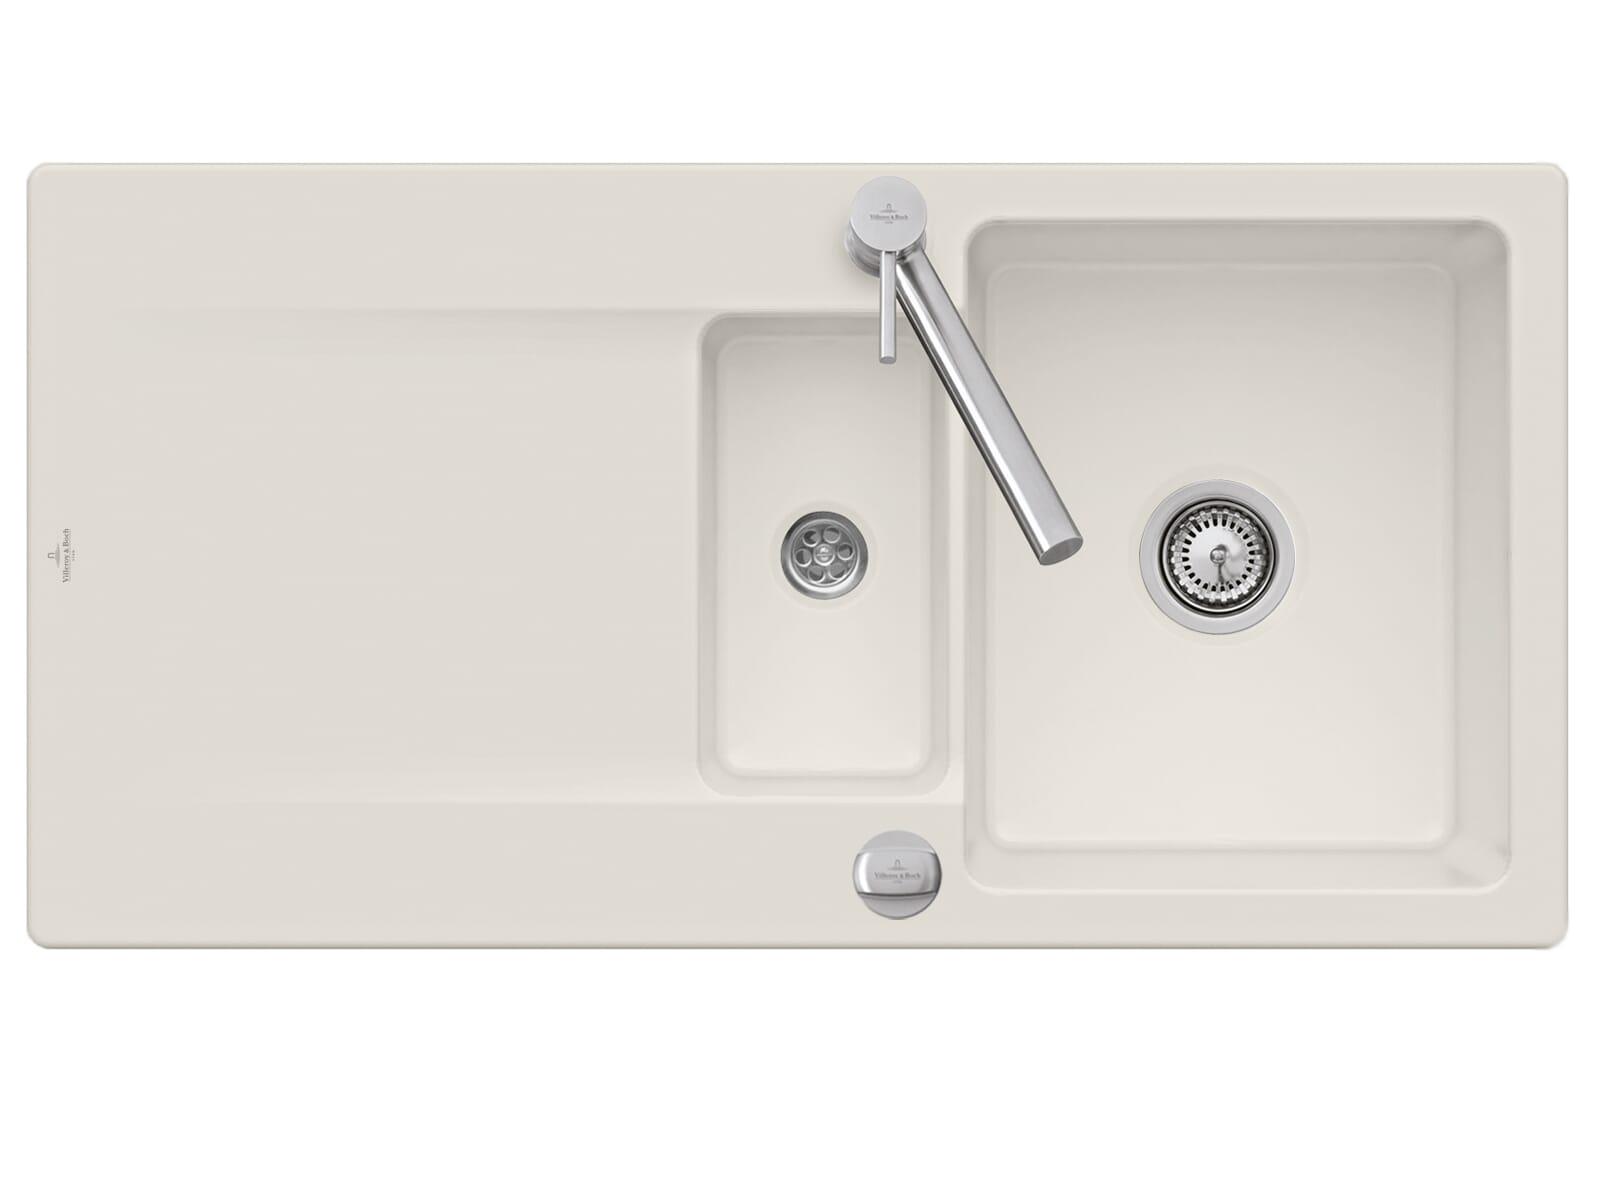 Villeroy & Boch Siluet 60 R - 3337 02 KR Crema Keramikspüle Excenterbetätigung